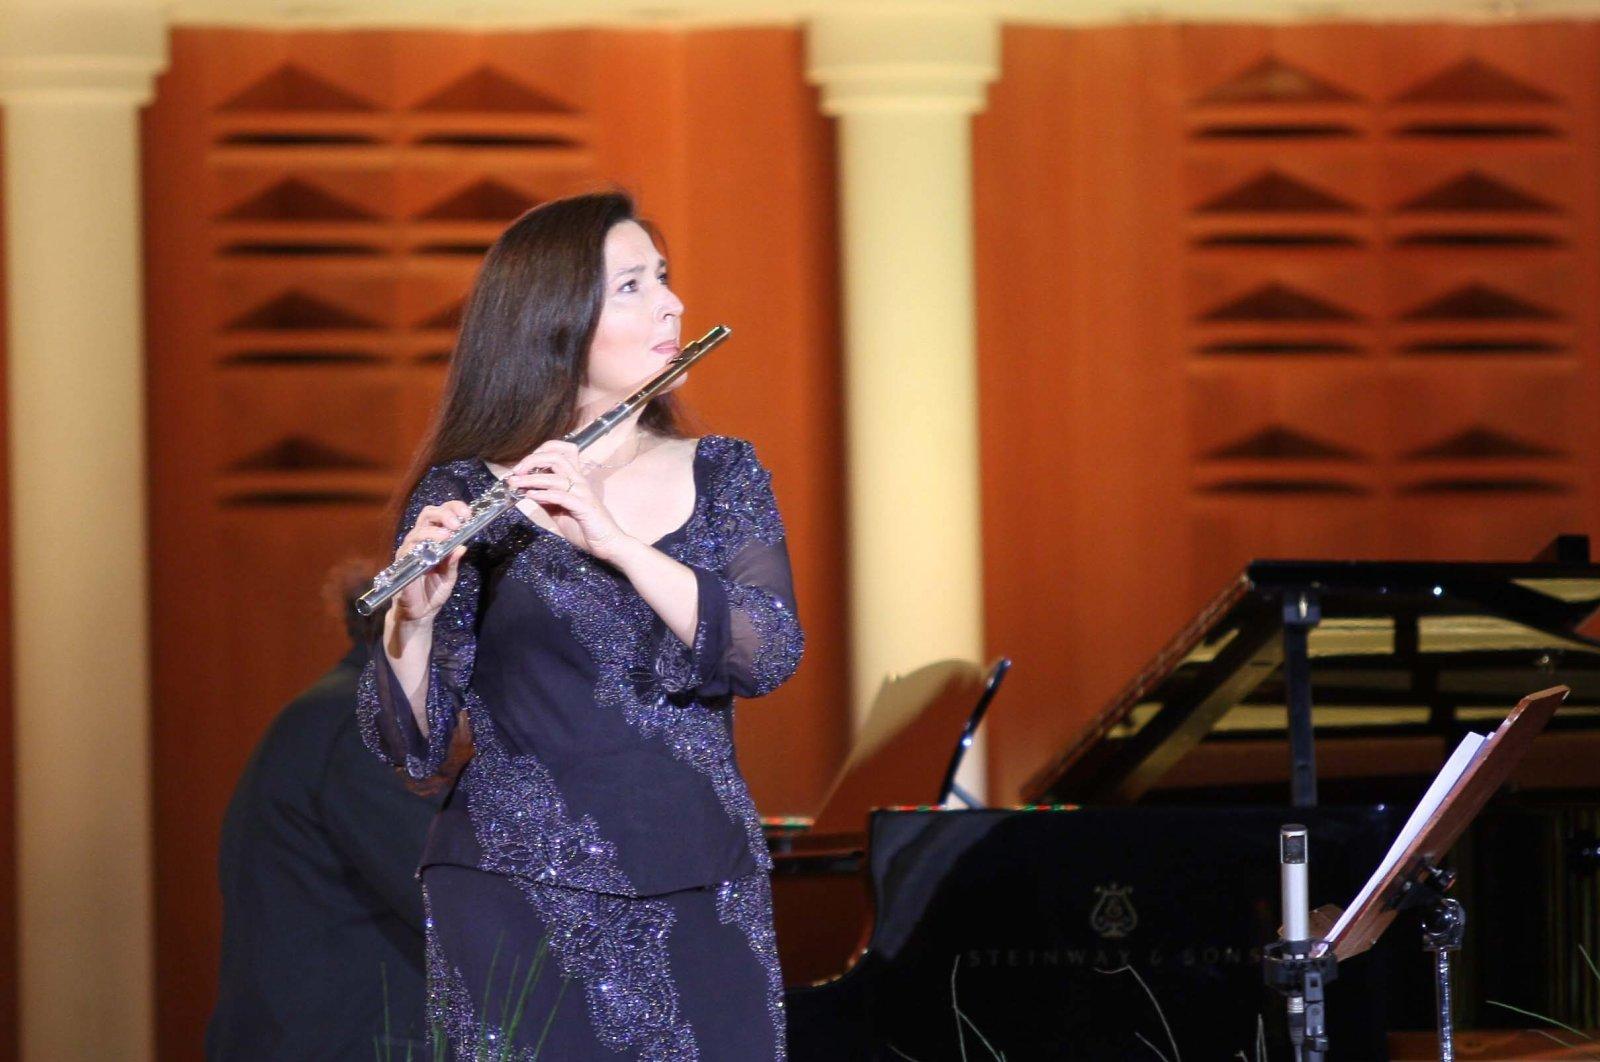 Şefika Kutluer performs at the celebration of 15th anniversary of International Organization of Turkic Culture (TÜRKSOY) in Ankara, Oct. 17, 2009. (Photo by Ali Ekeyılmaz)